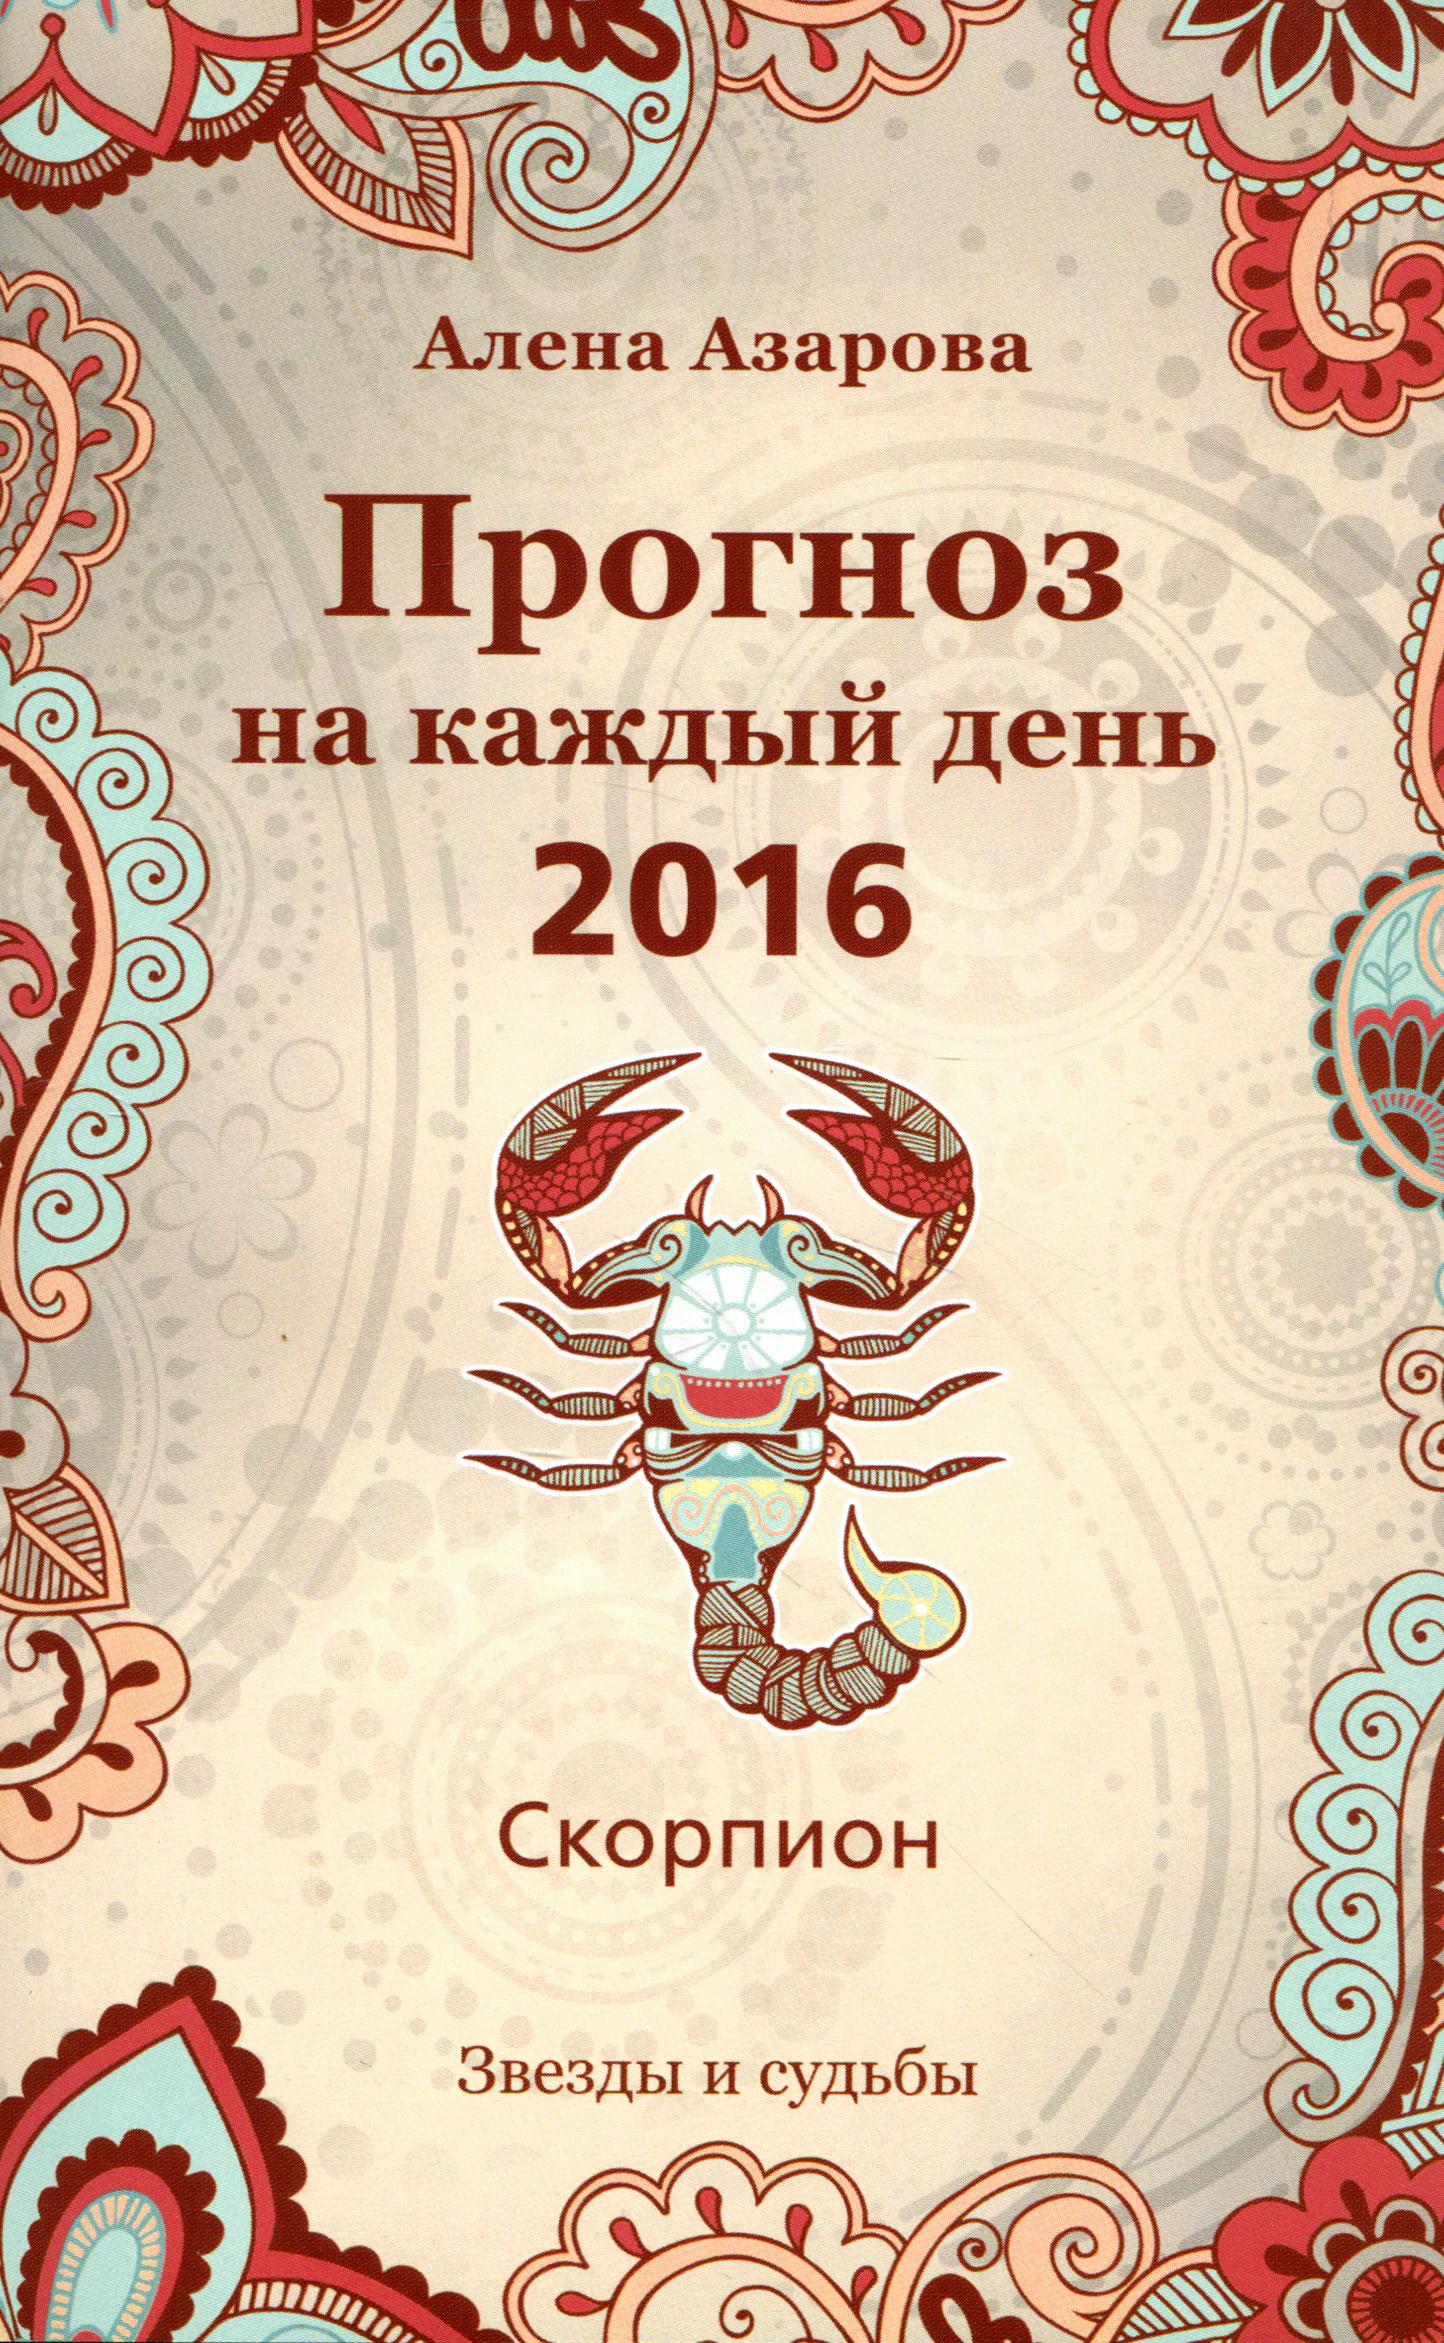 Алена Азарова Прогноз на каждый день. 2016 год. Скорпион